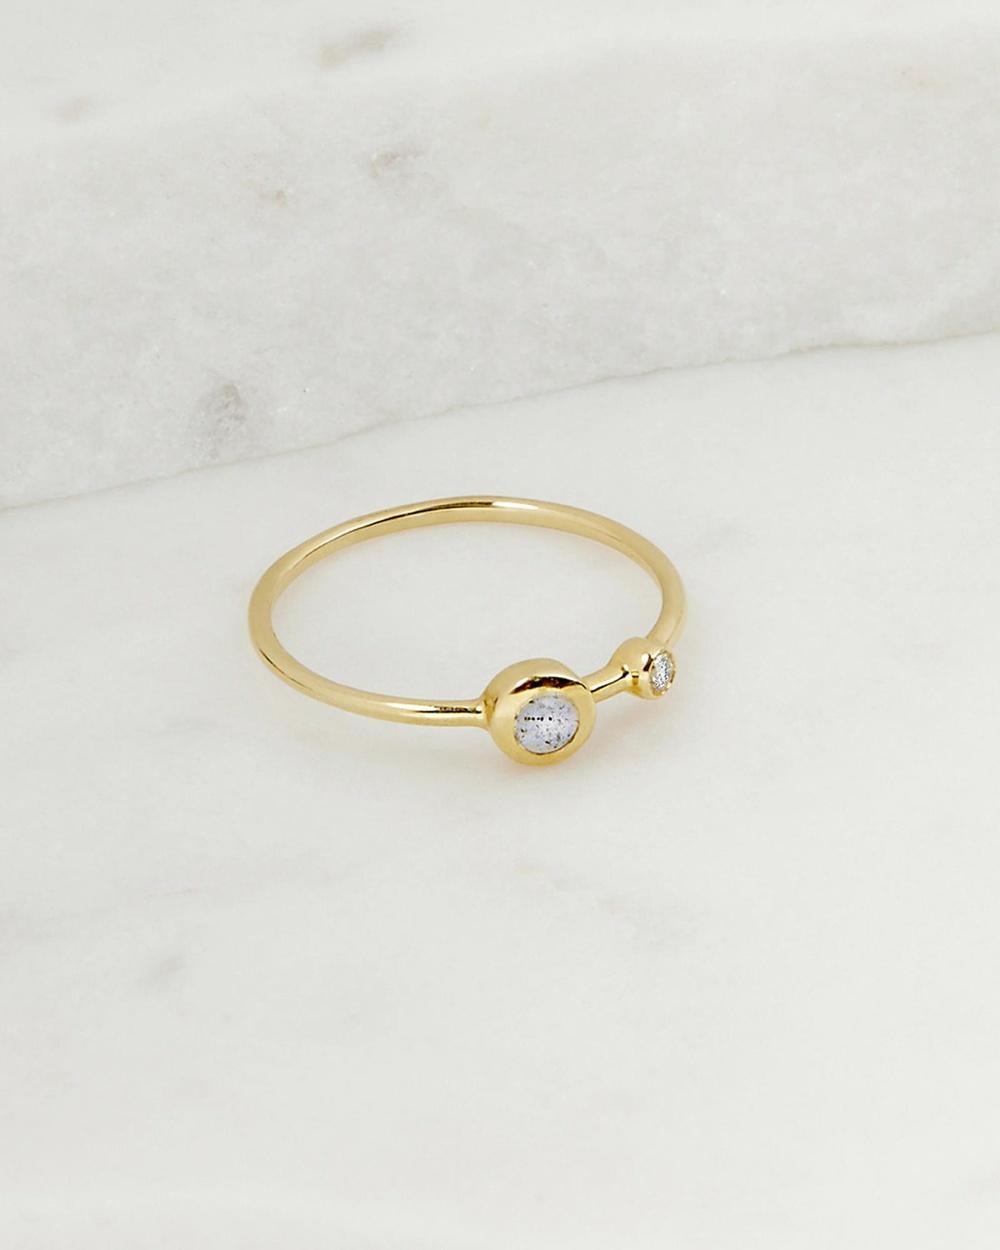 Luna Rae Solid Gold Stellar Ring Jewellery Gold